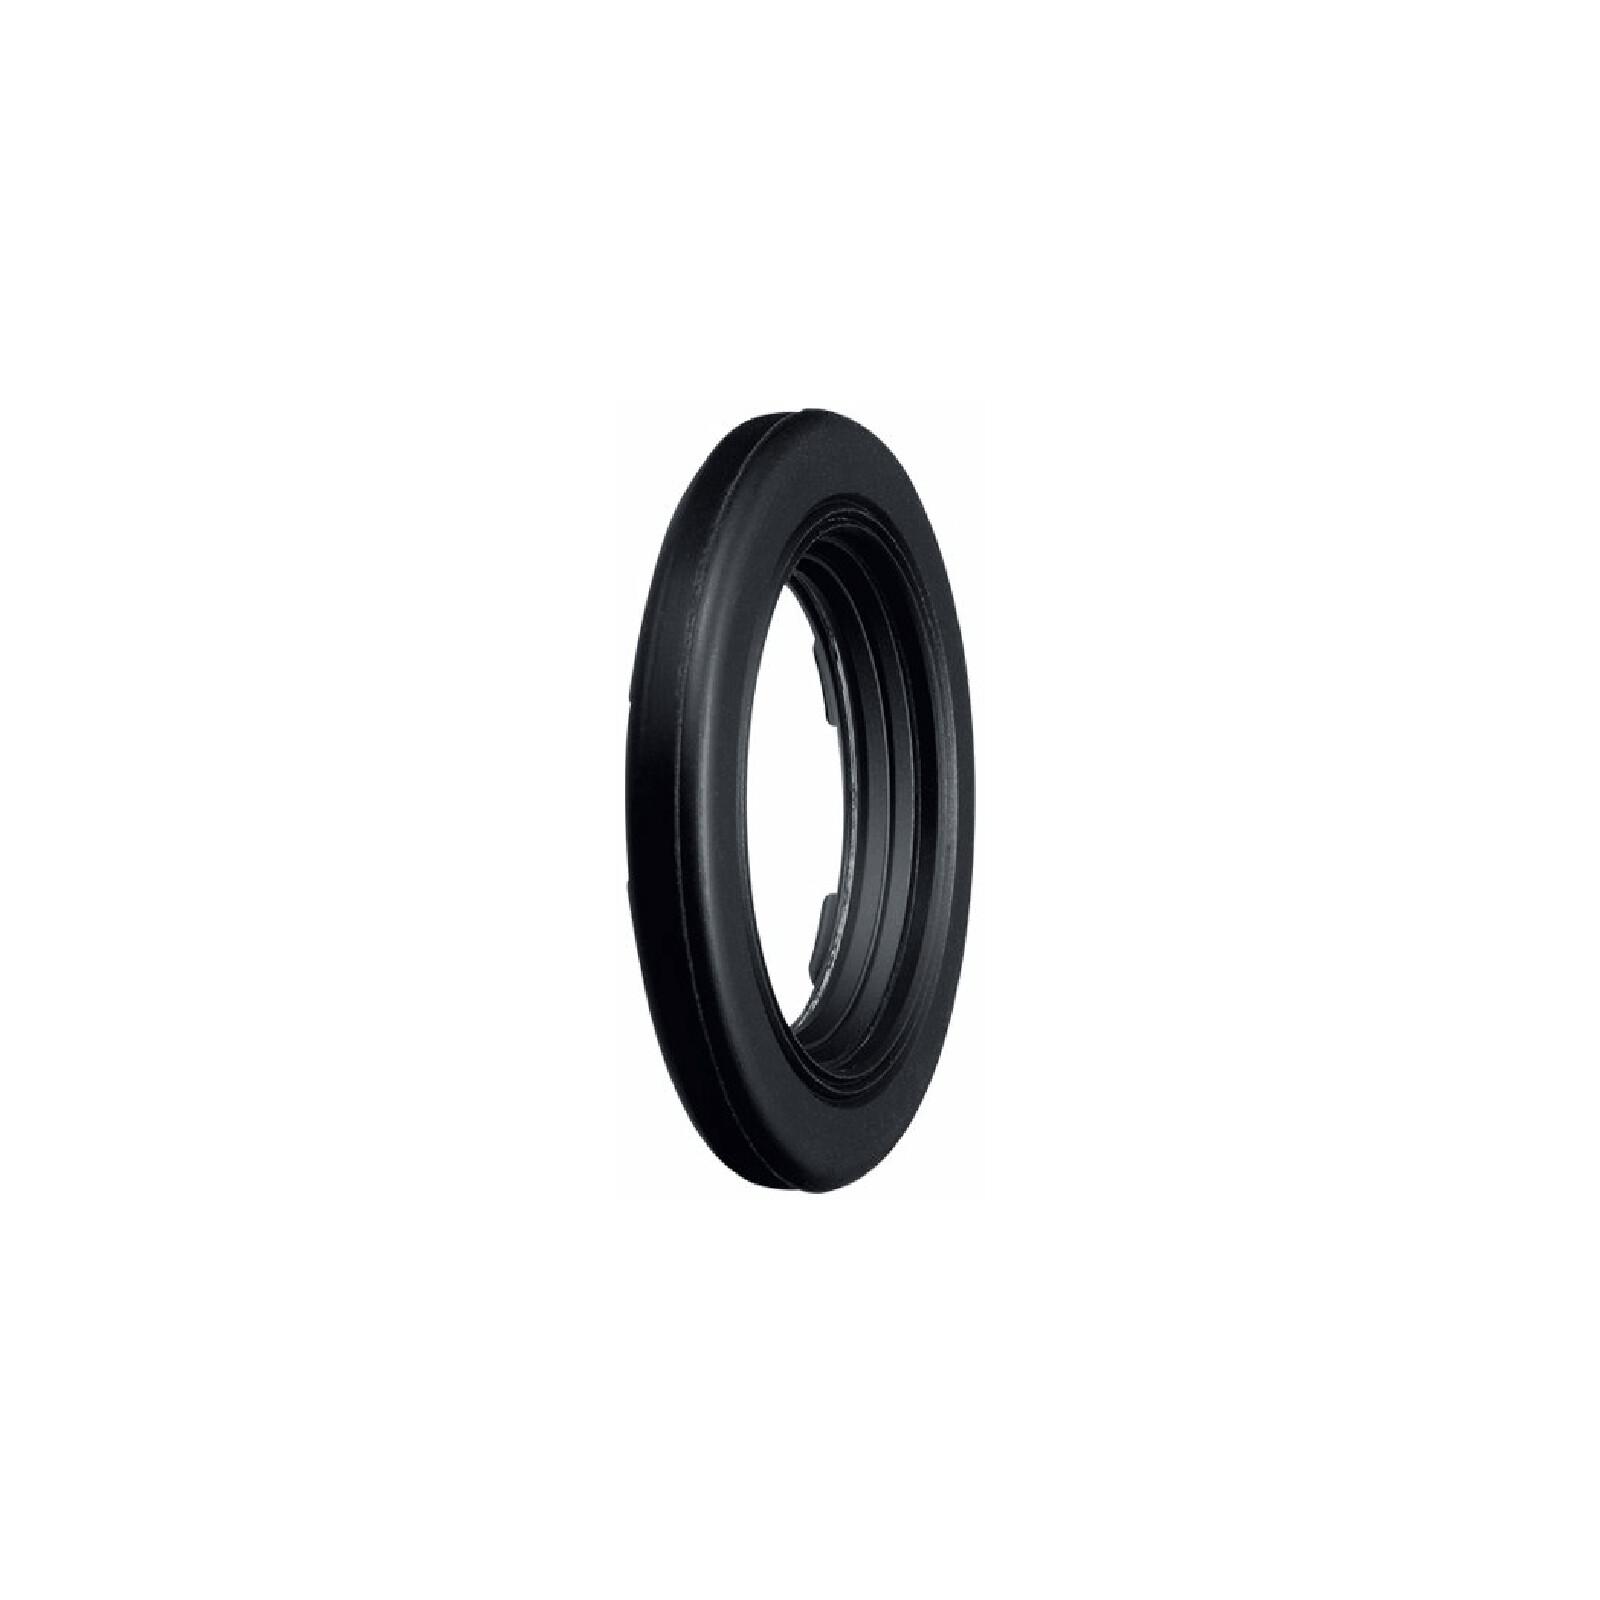 Nikon DK-17C -2 Korrekturlinse